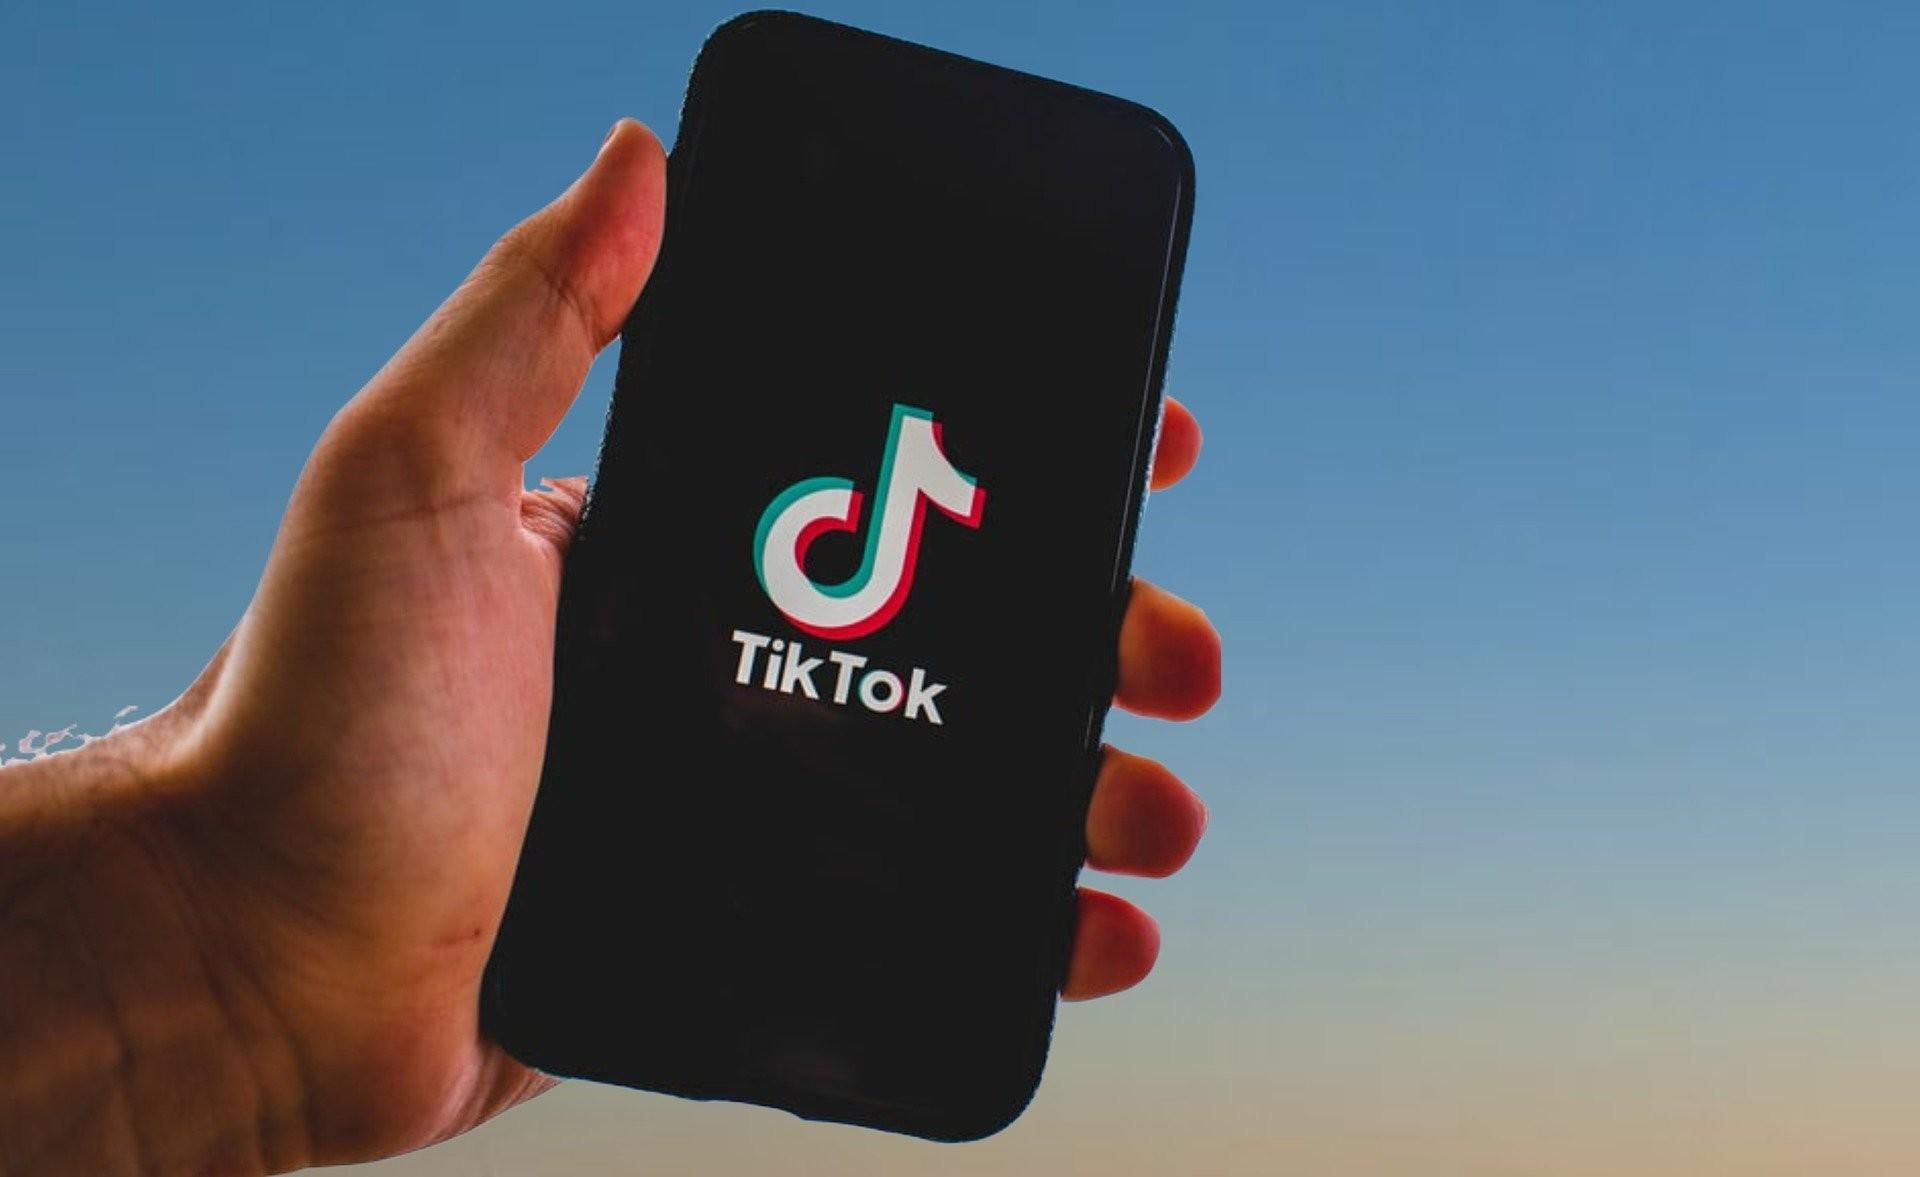 poner subtítulos en TikTok